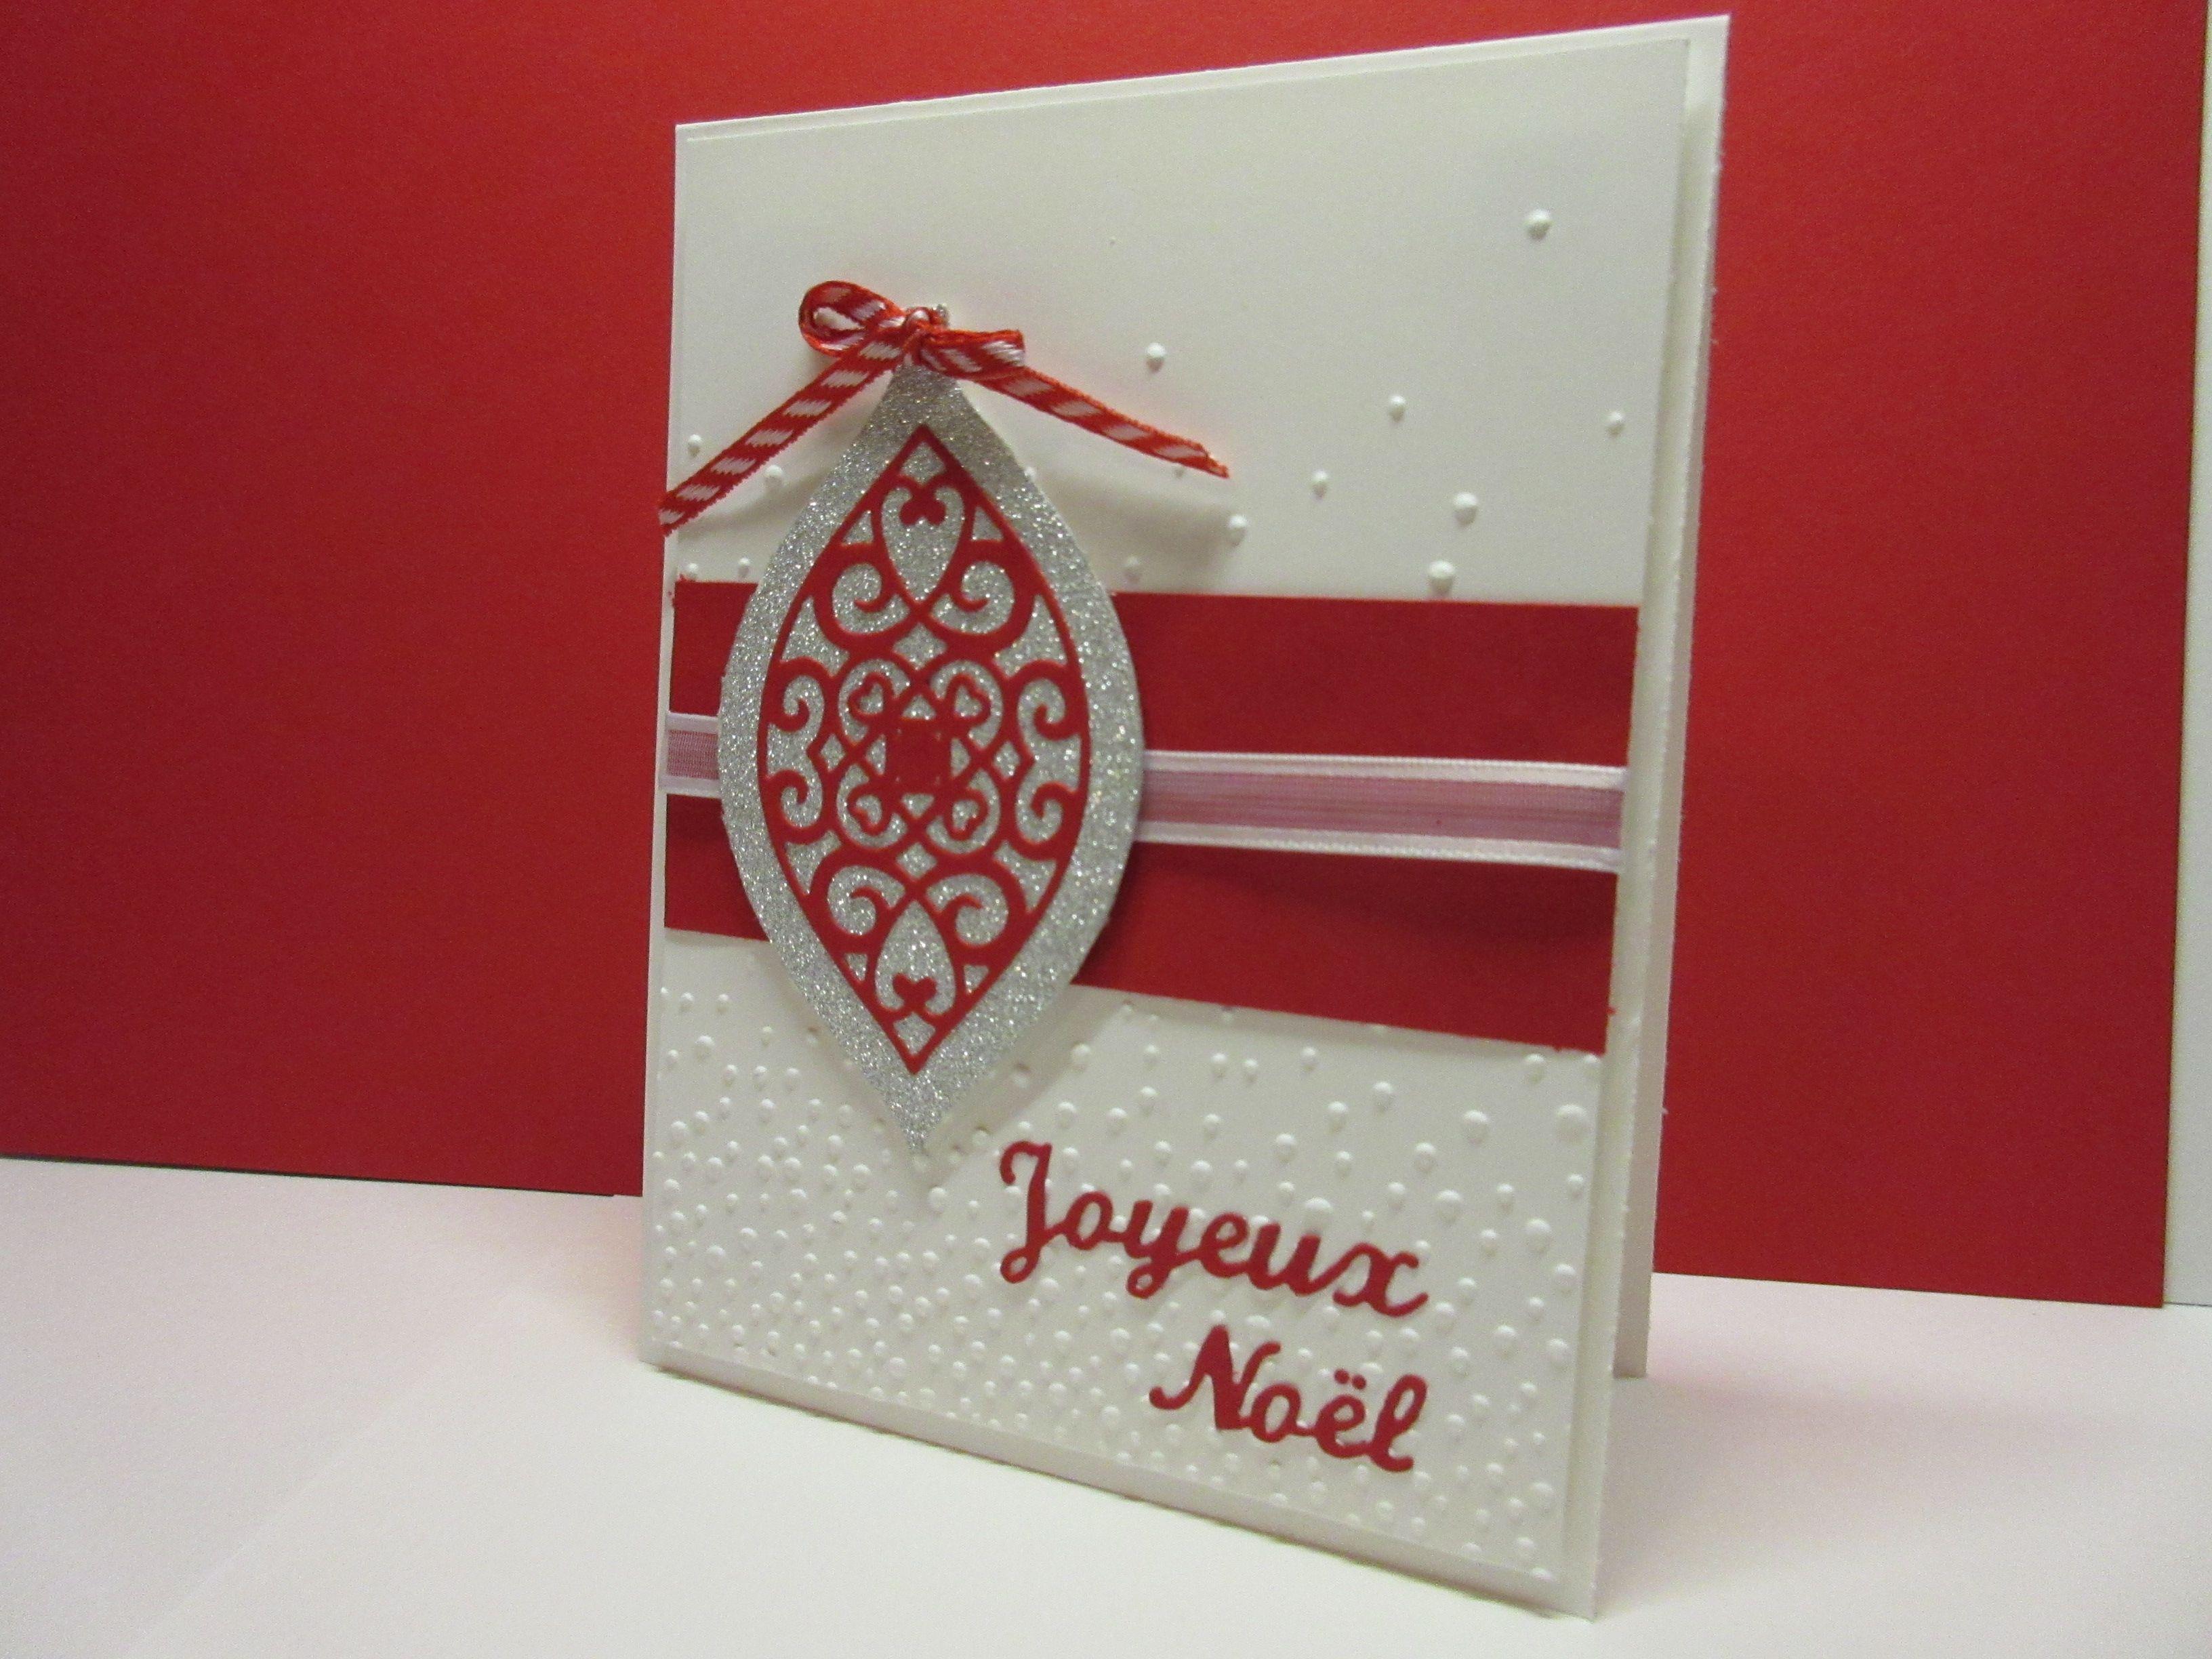 Boule de Noël 2015 France | Ornament card, Holiday, Holiday decor